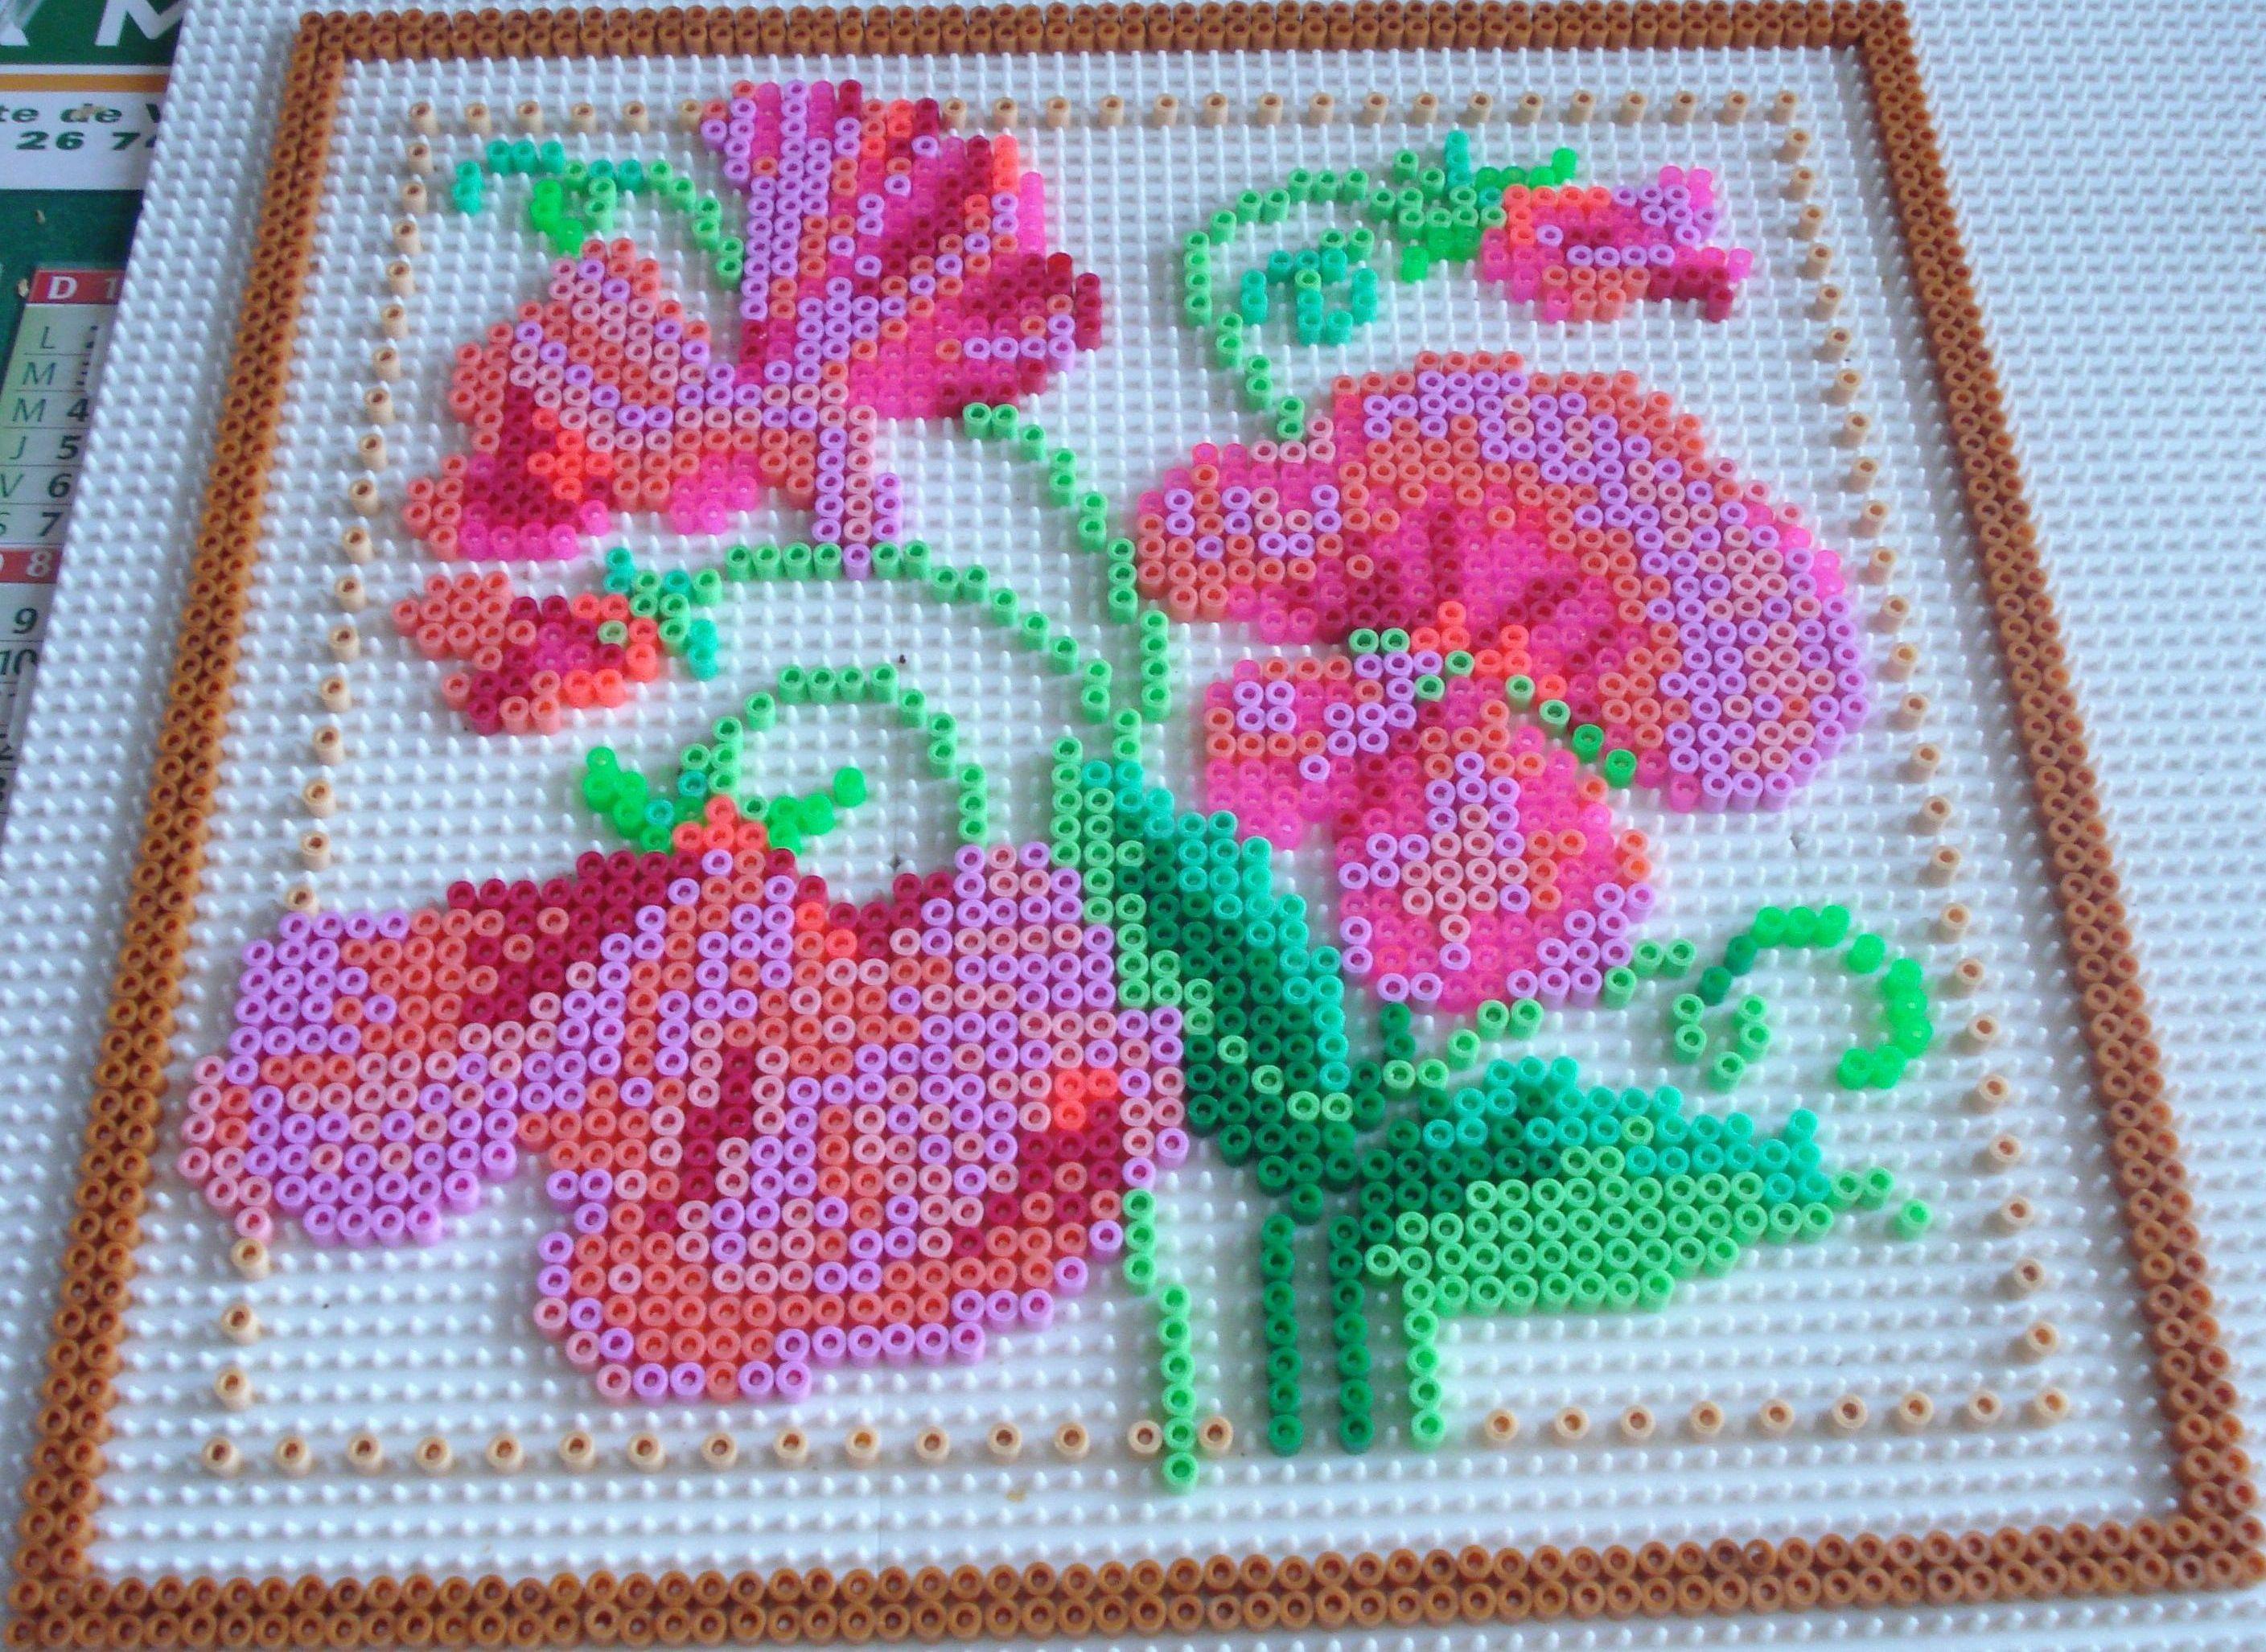 flowers hama perler beads by chantal jacquinet b gelperlen. Black Bedroom Furniture Sets. Home Design Ideas